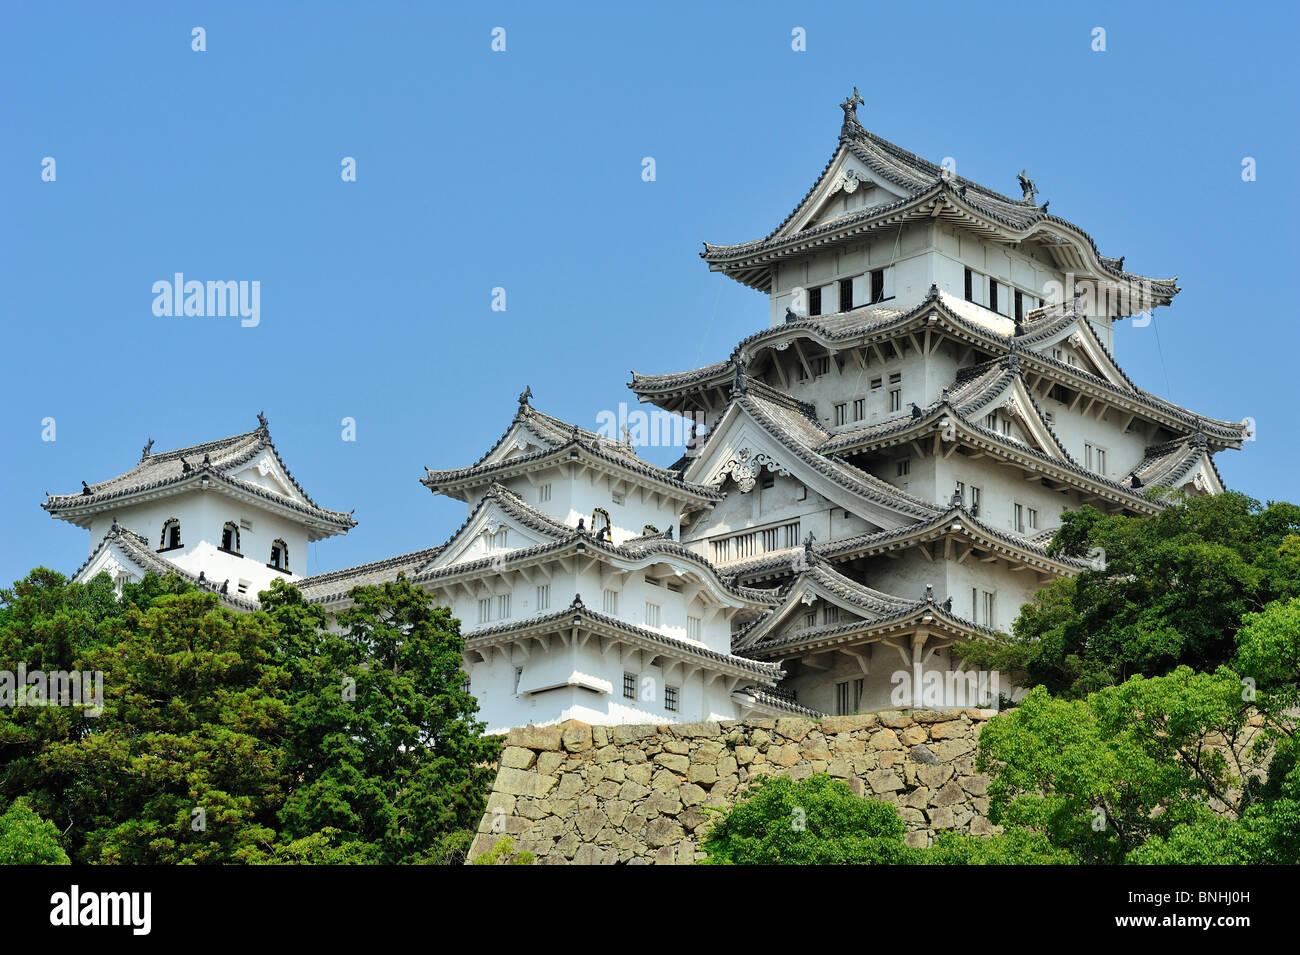 Japan himeji castle himeji city hyogo prefecture honshu island japan himeji castle himeji city hyogo prefecture honshu island unesco world heritage site architecture asia castle donjon publicscrutiny Images